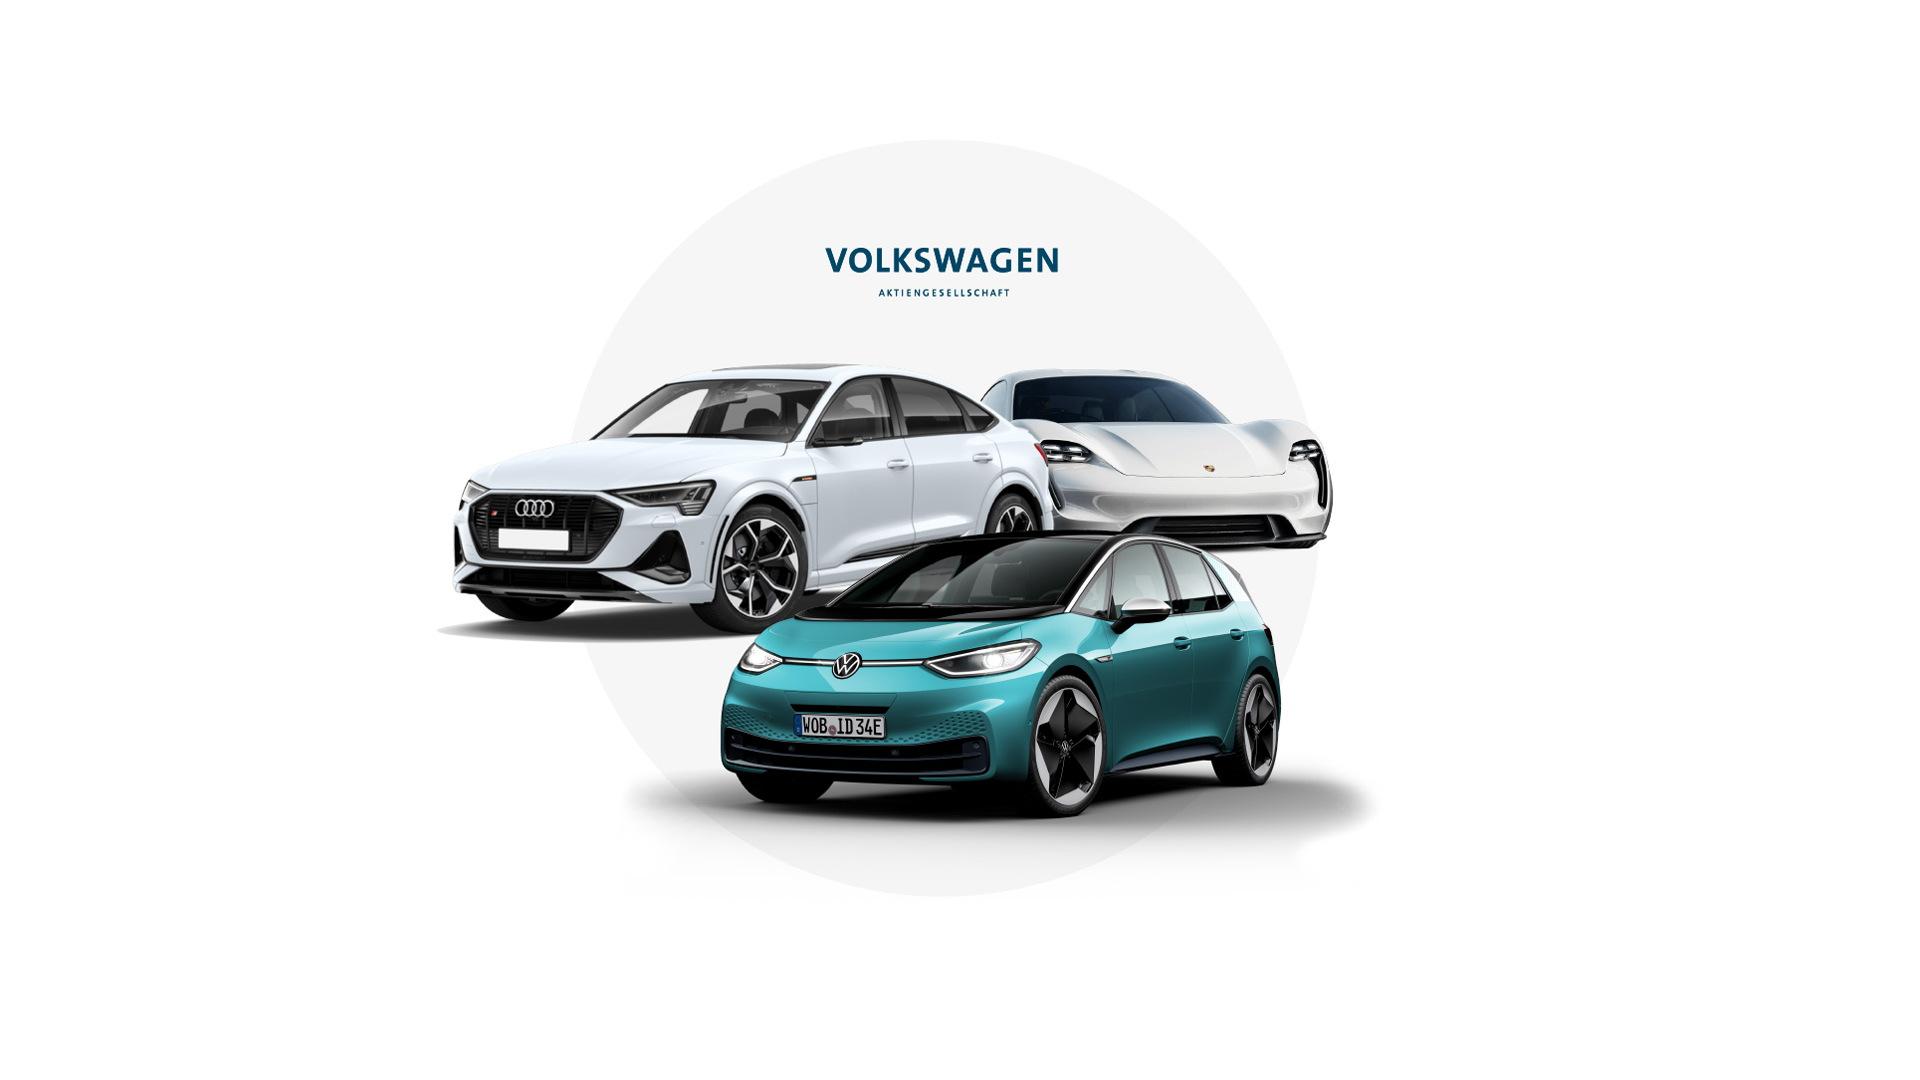 Volkswagen Group electric vehicles in 2020